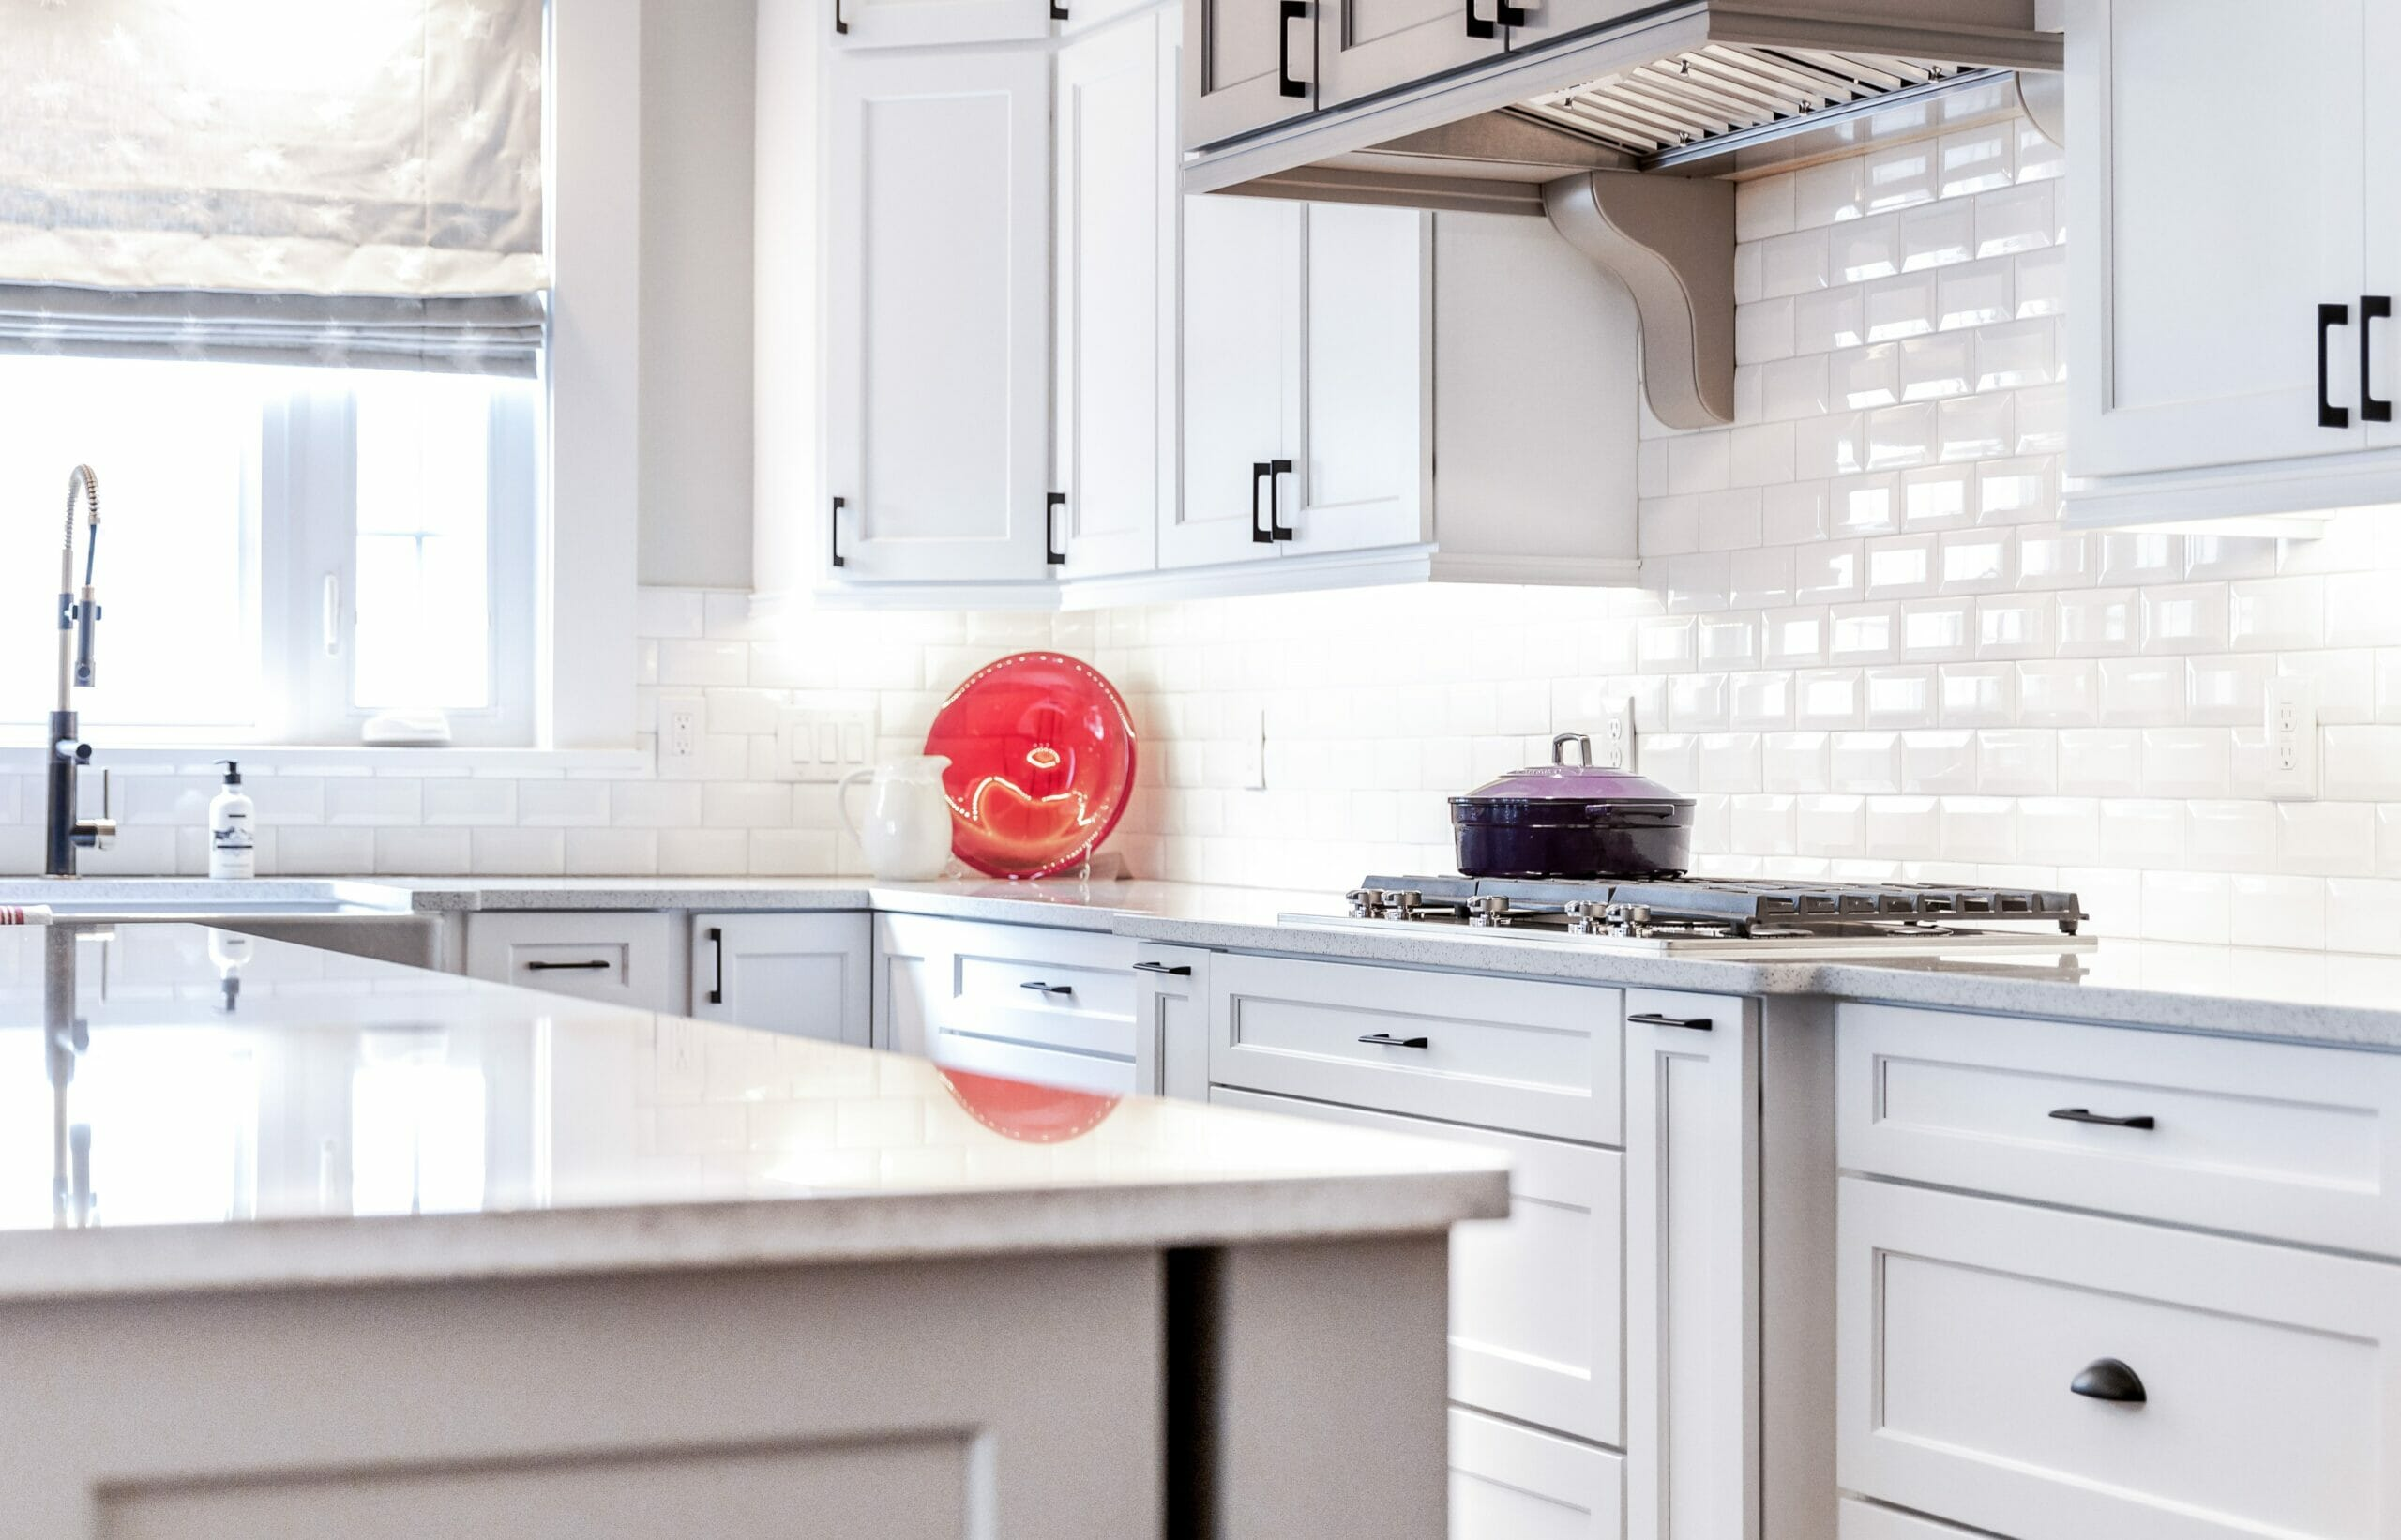 myers-kitchen-3-scaled